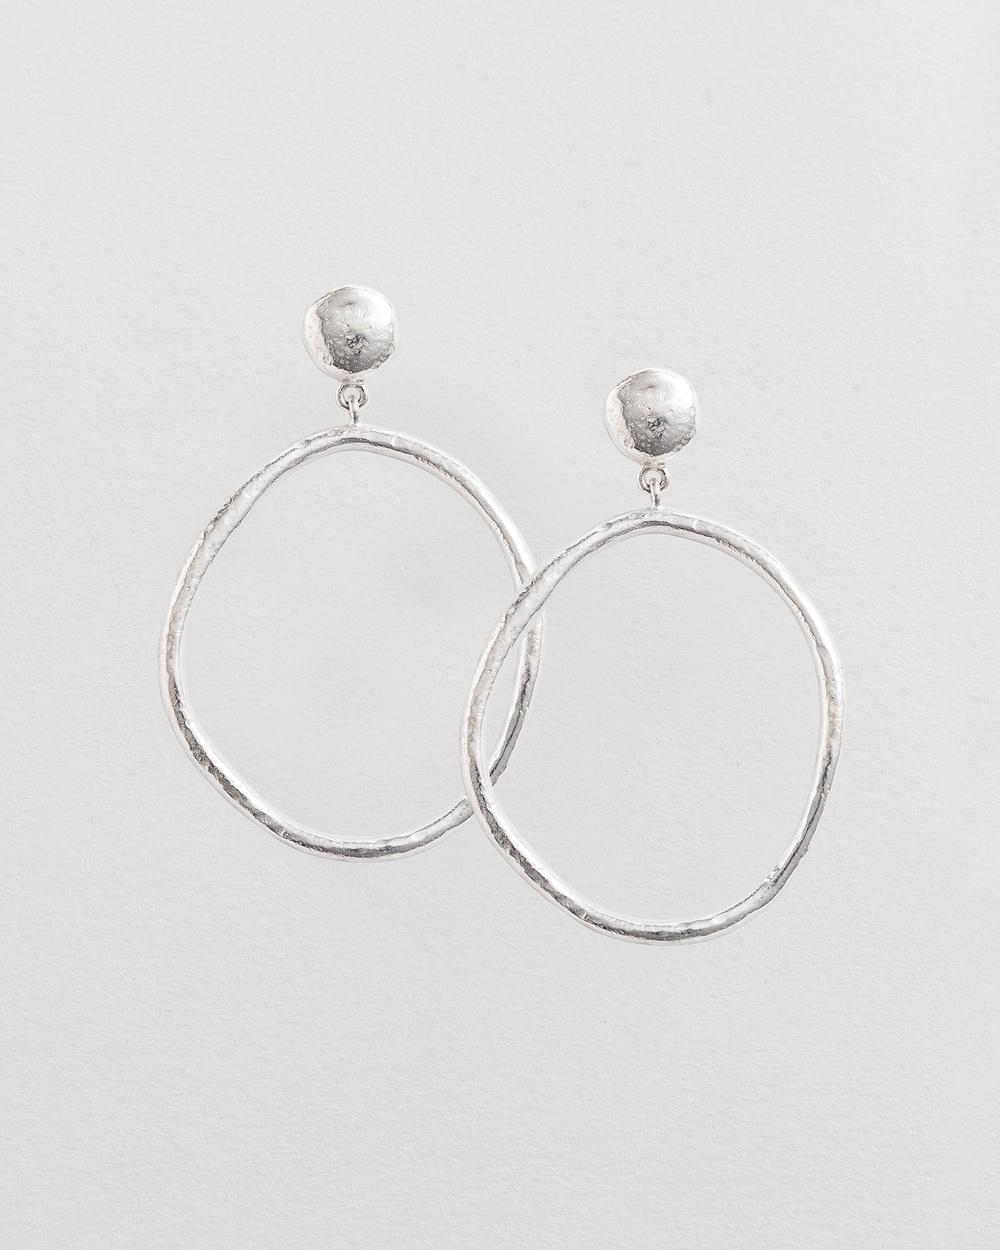 Kirstin Ash Golden Light Earrings Jewellery Silver